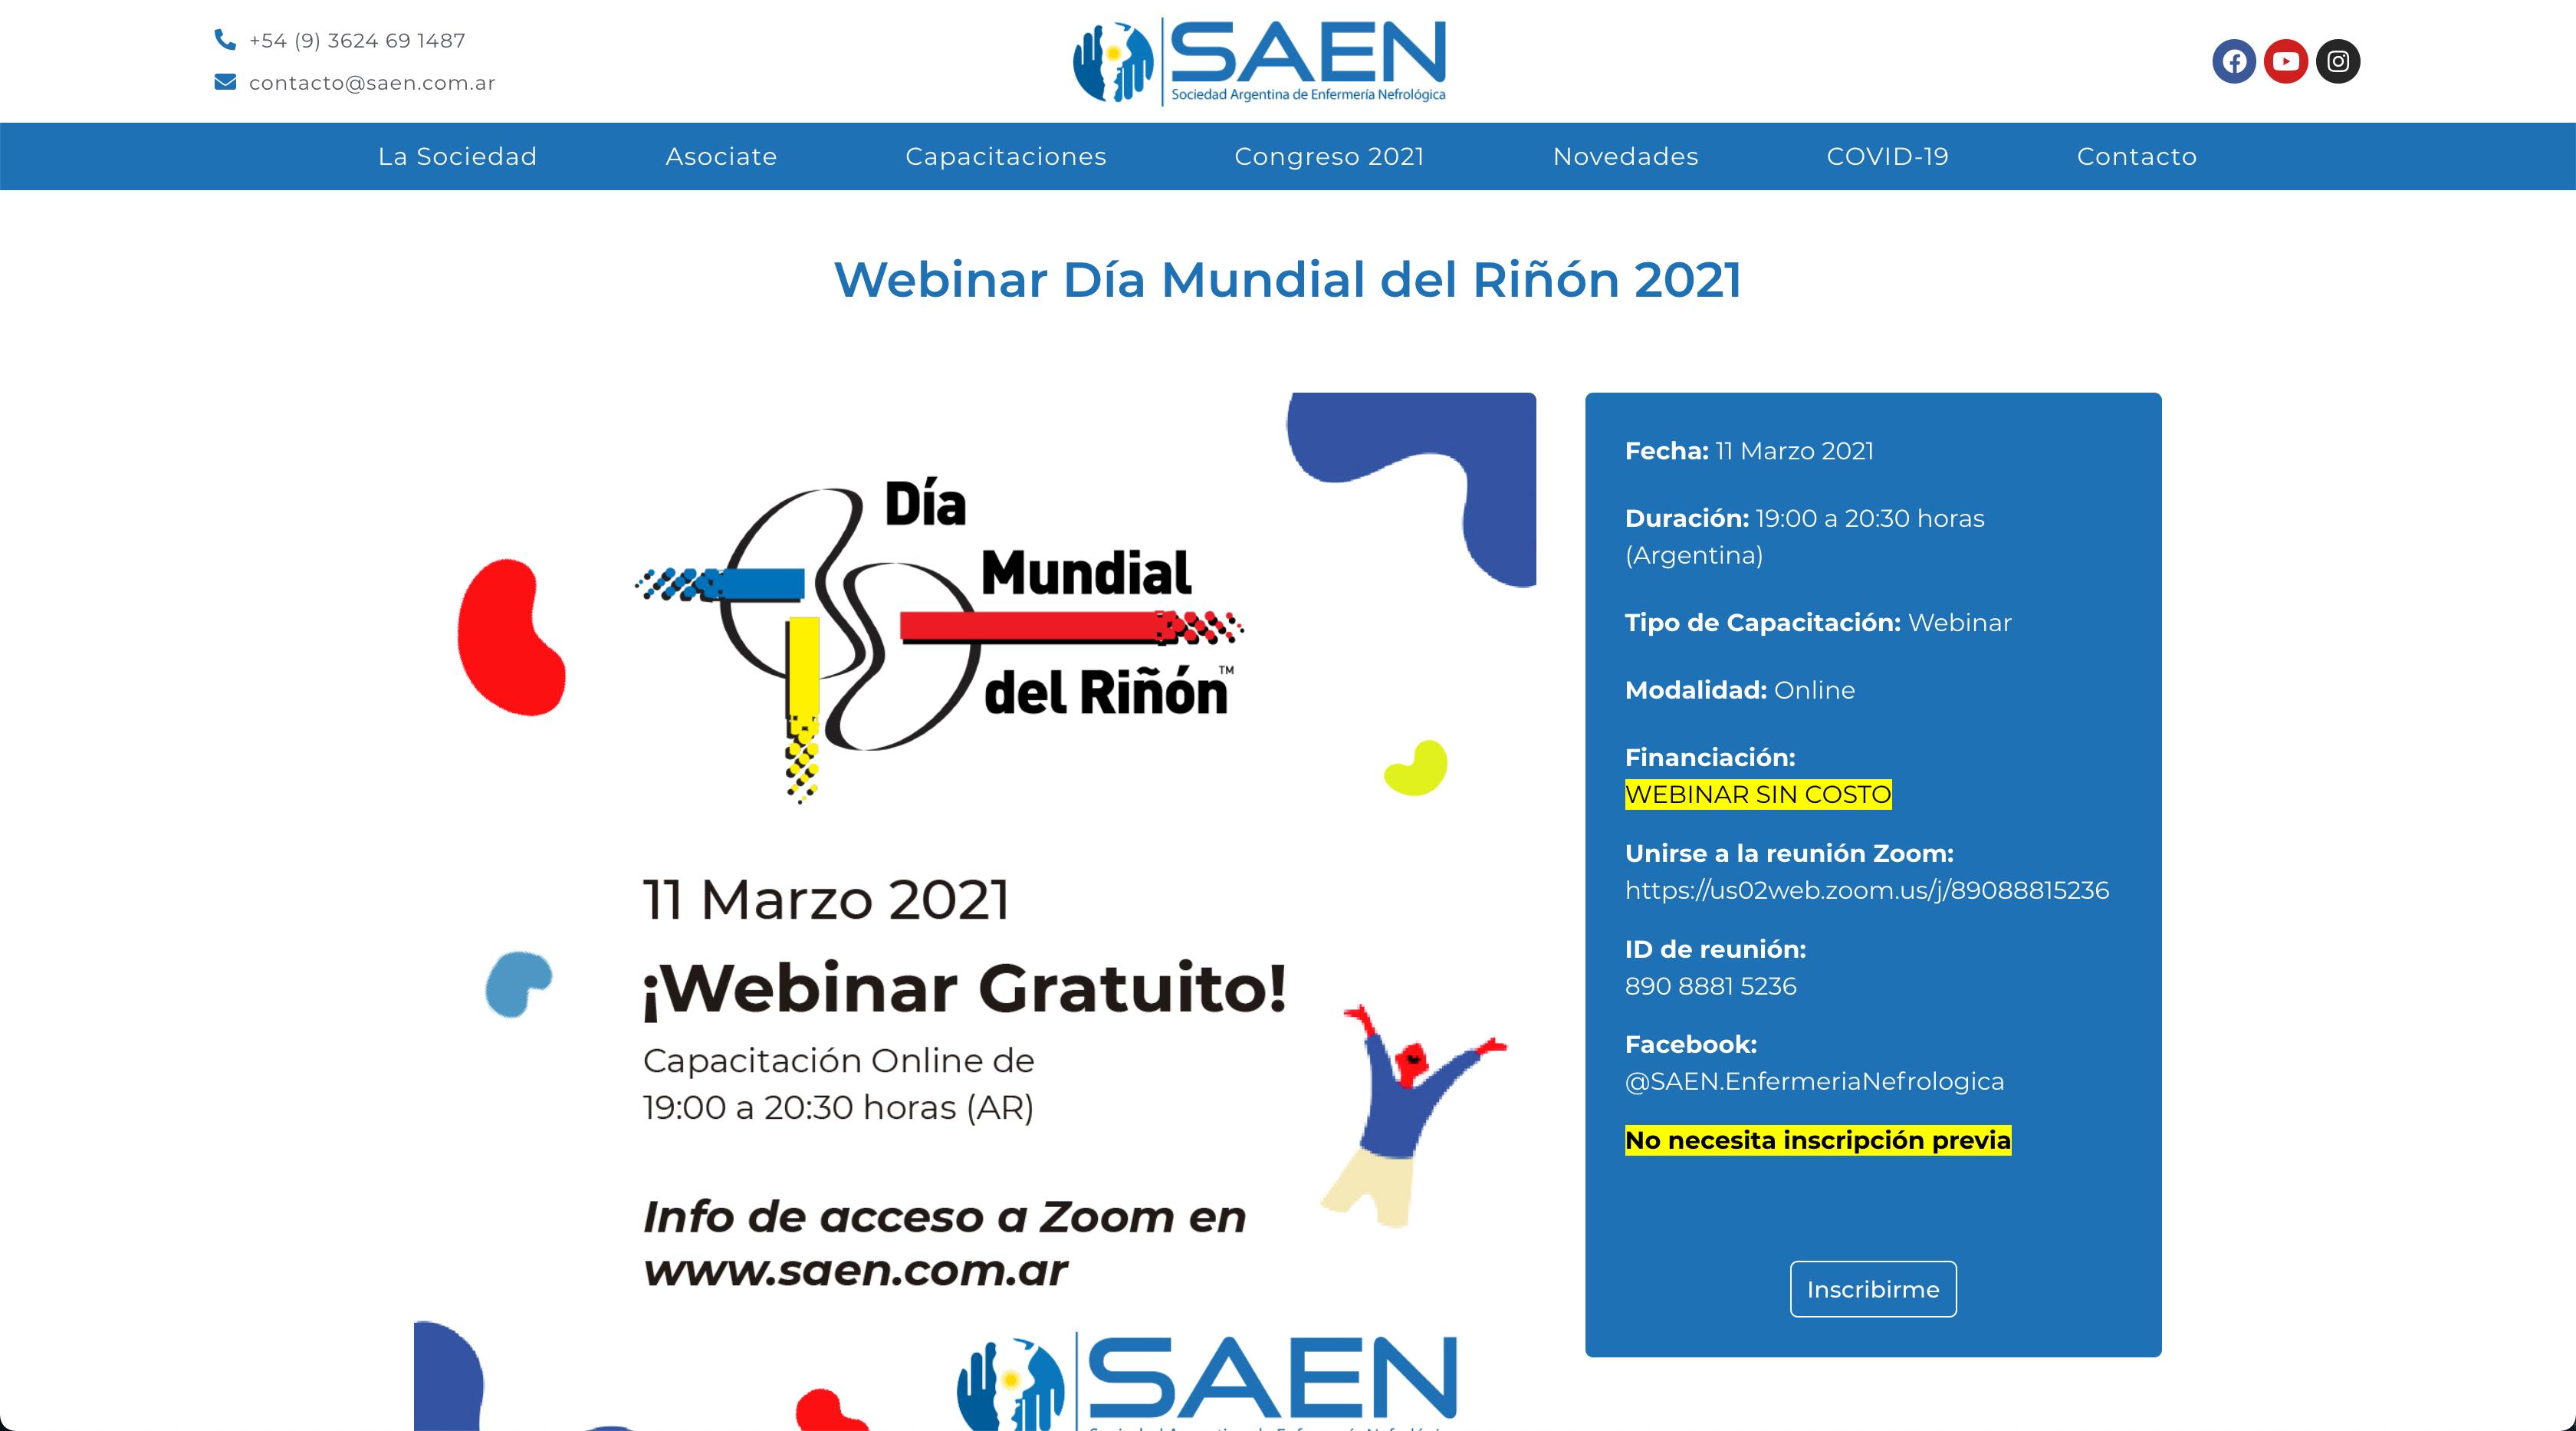 saen-sociedad-argentina-de-enfermeria-nefrologica-online-lab-web-development-web-design-14